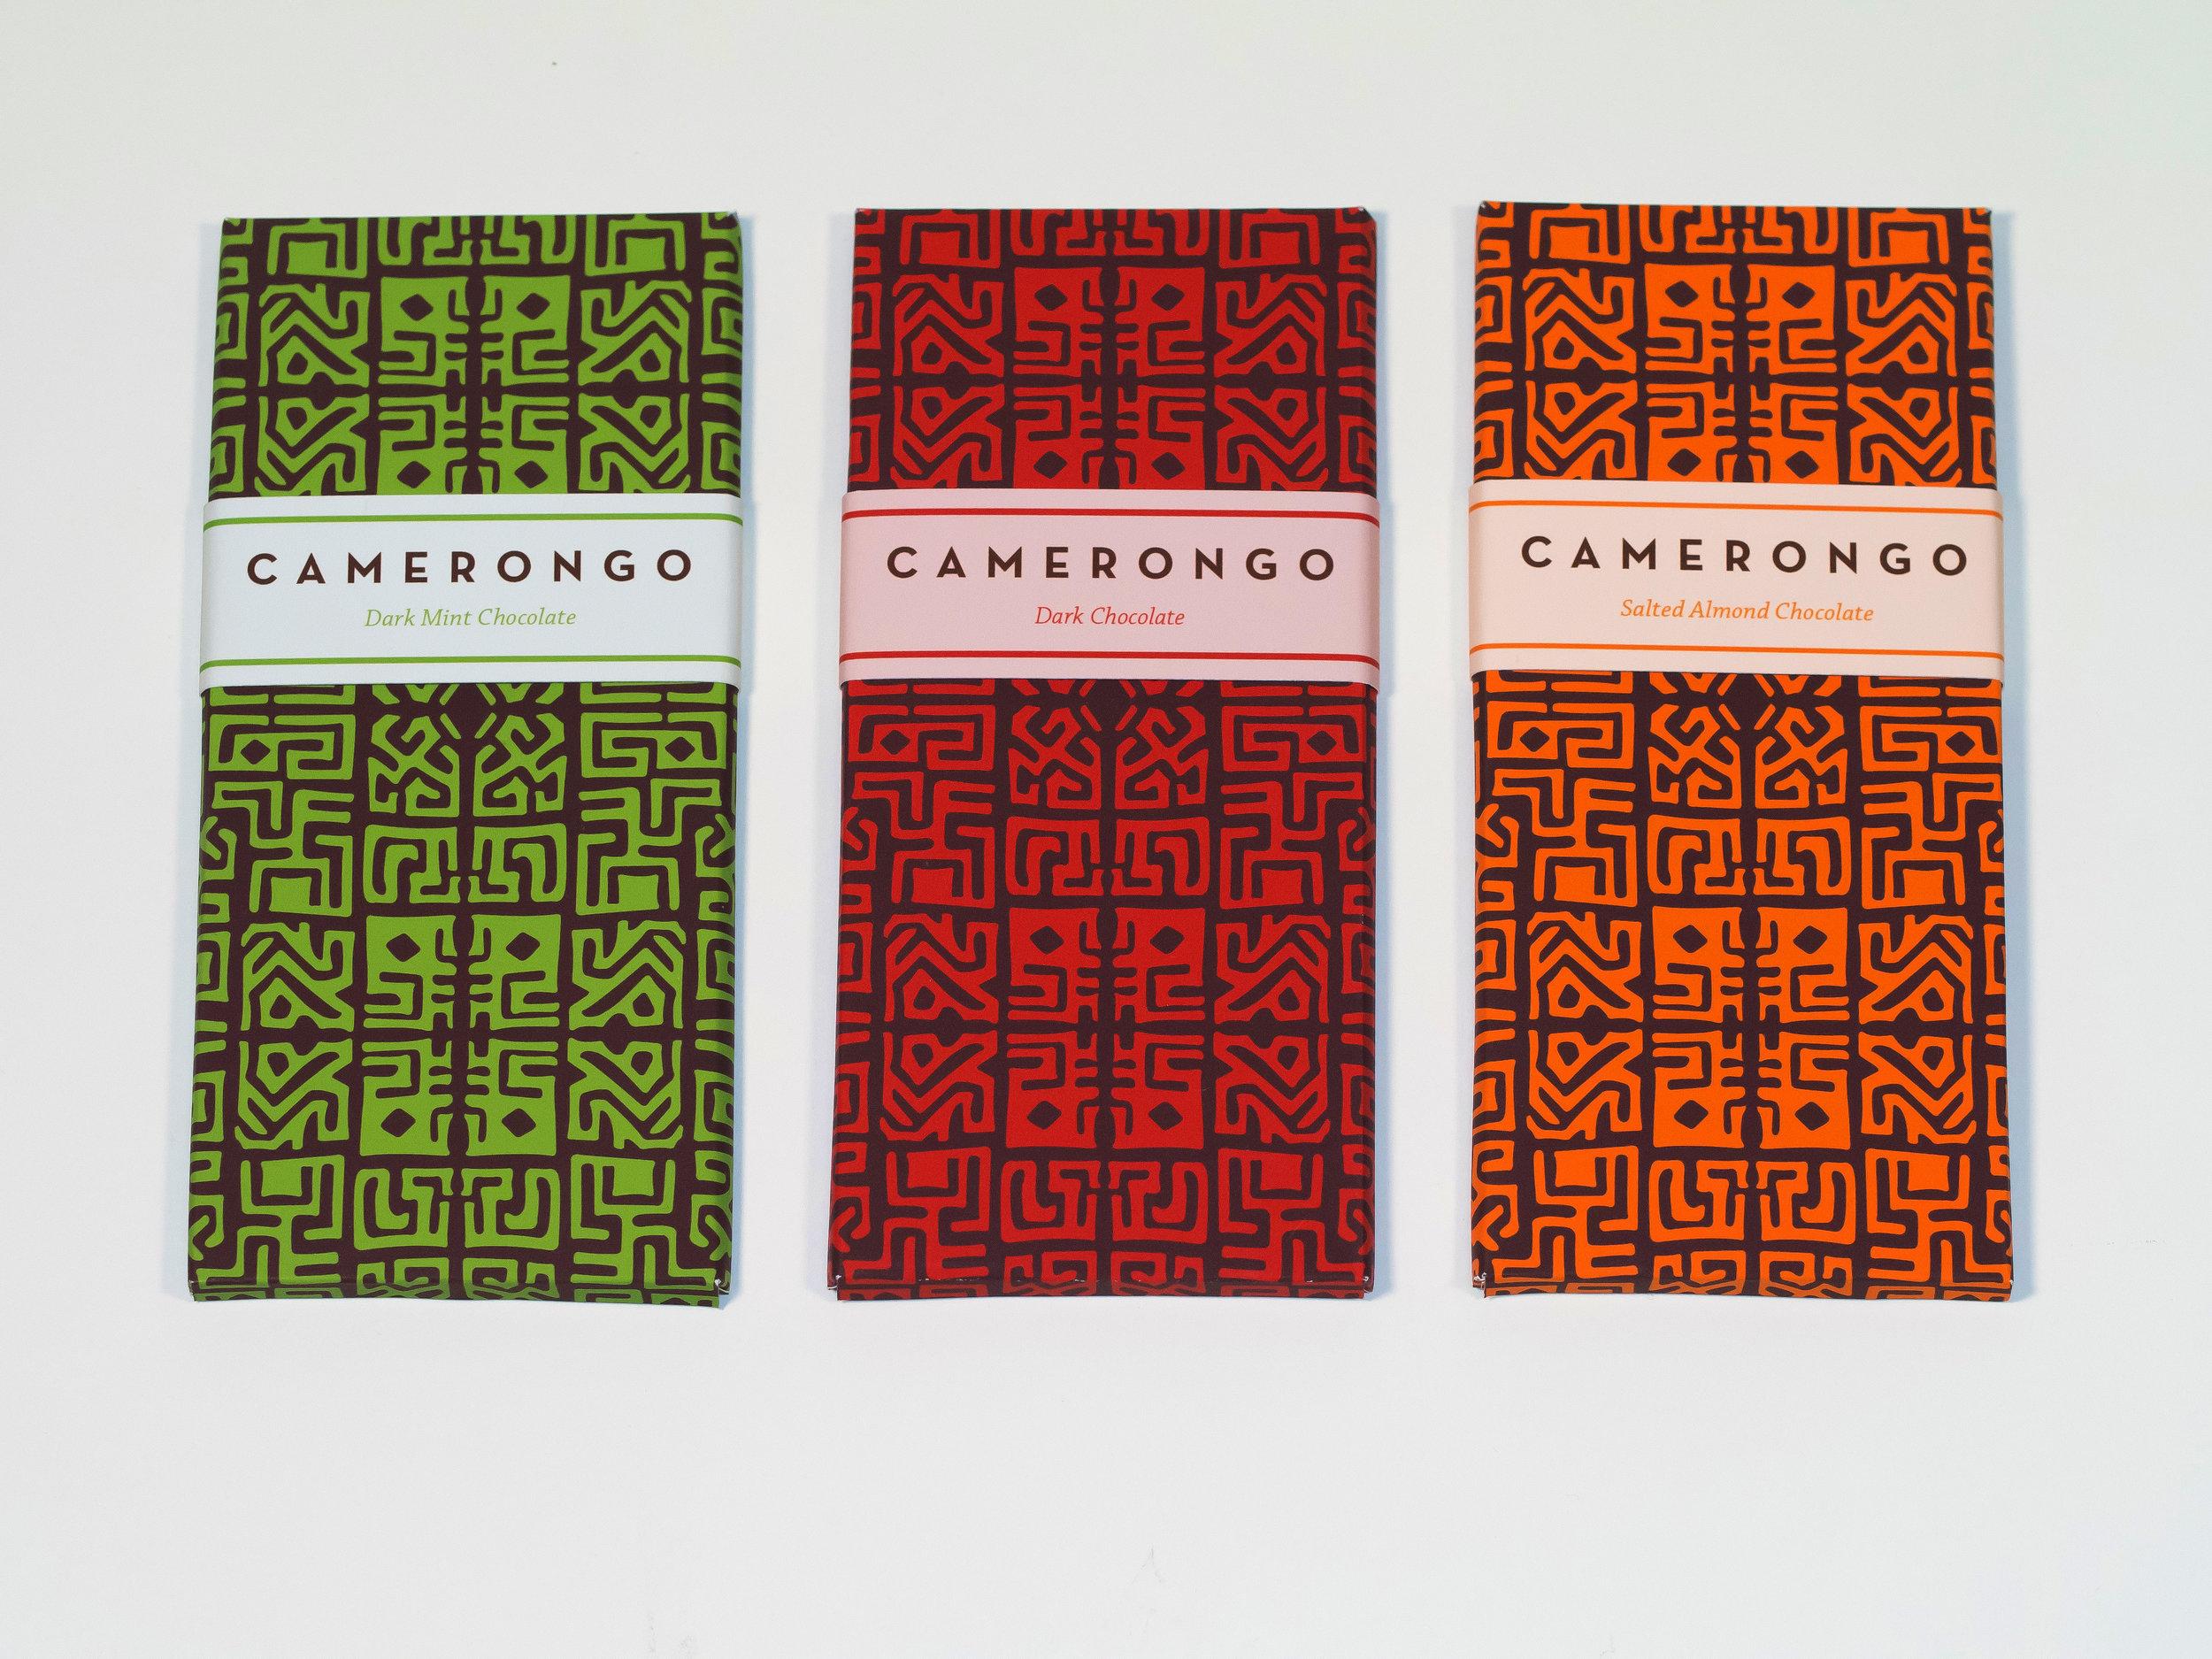 Camerongo 1 Edit.jpg